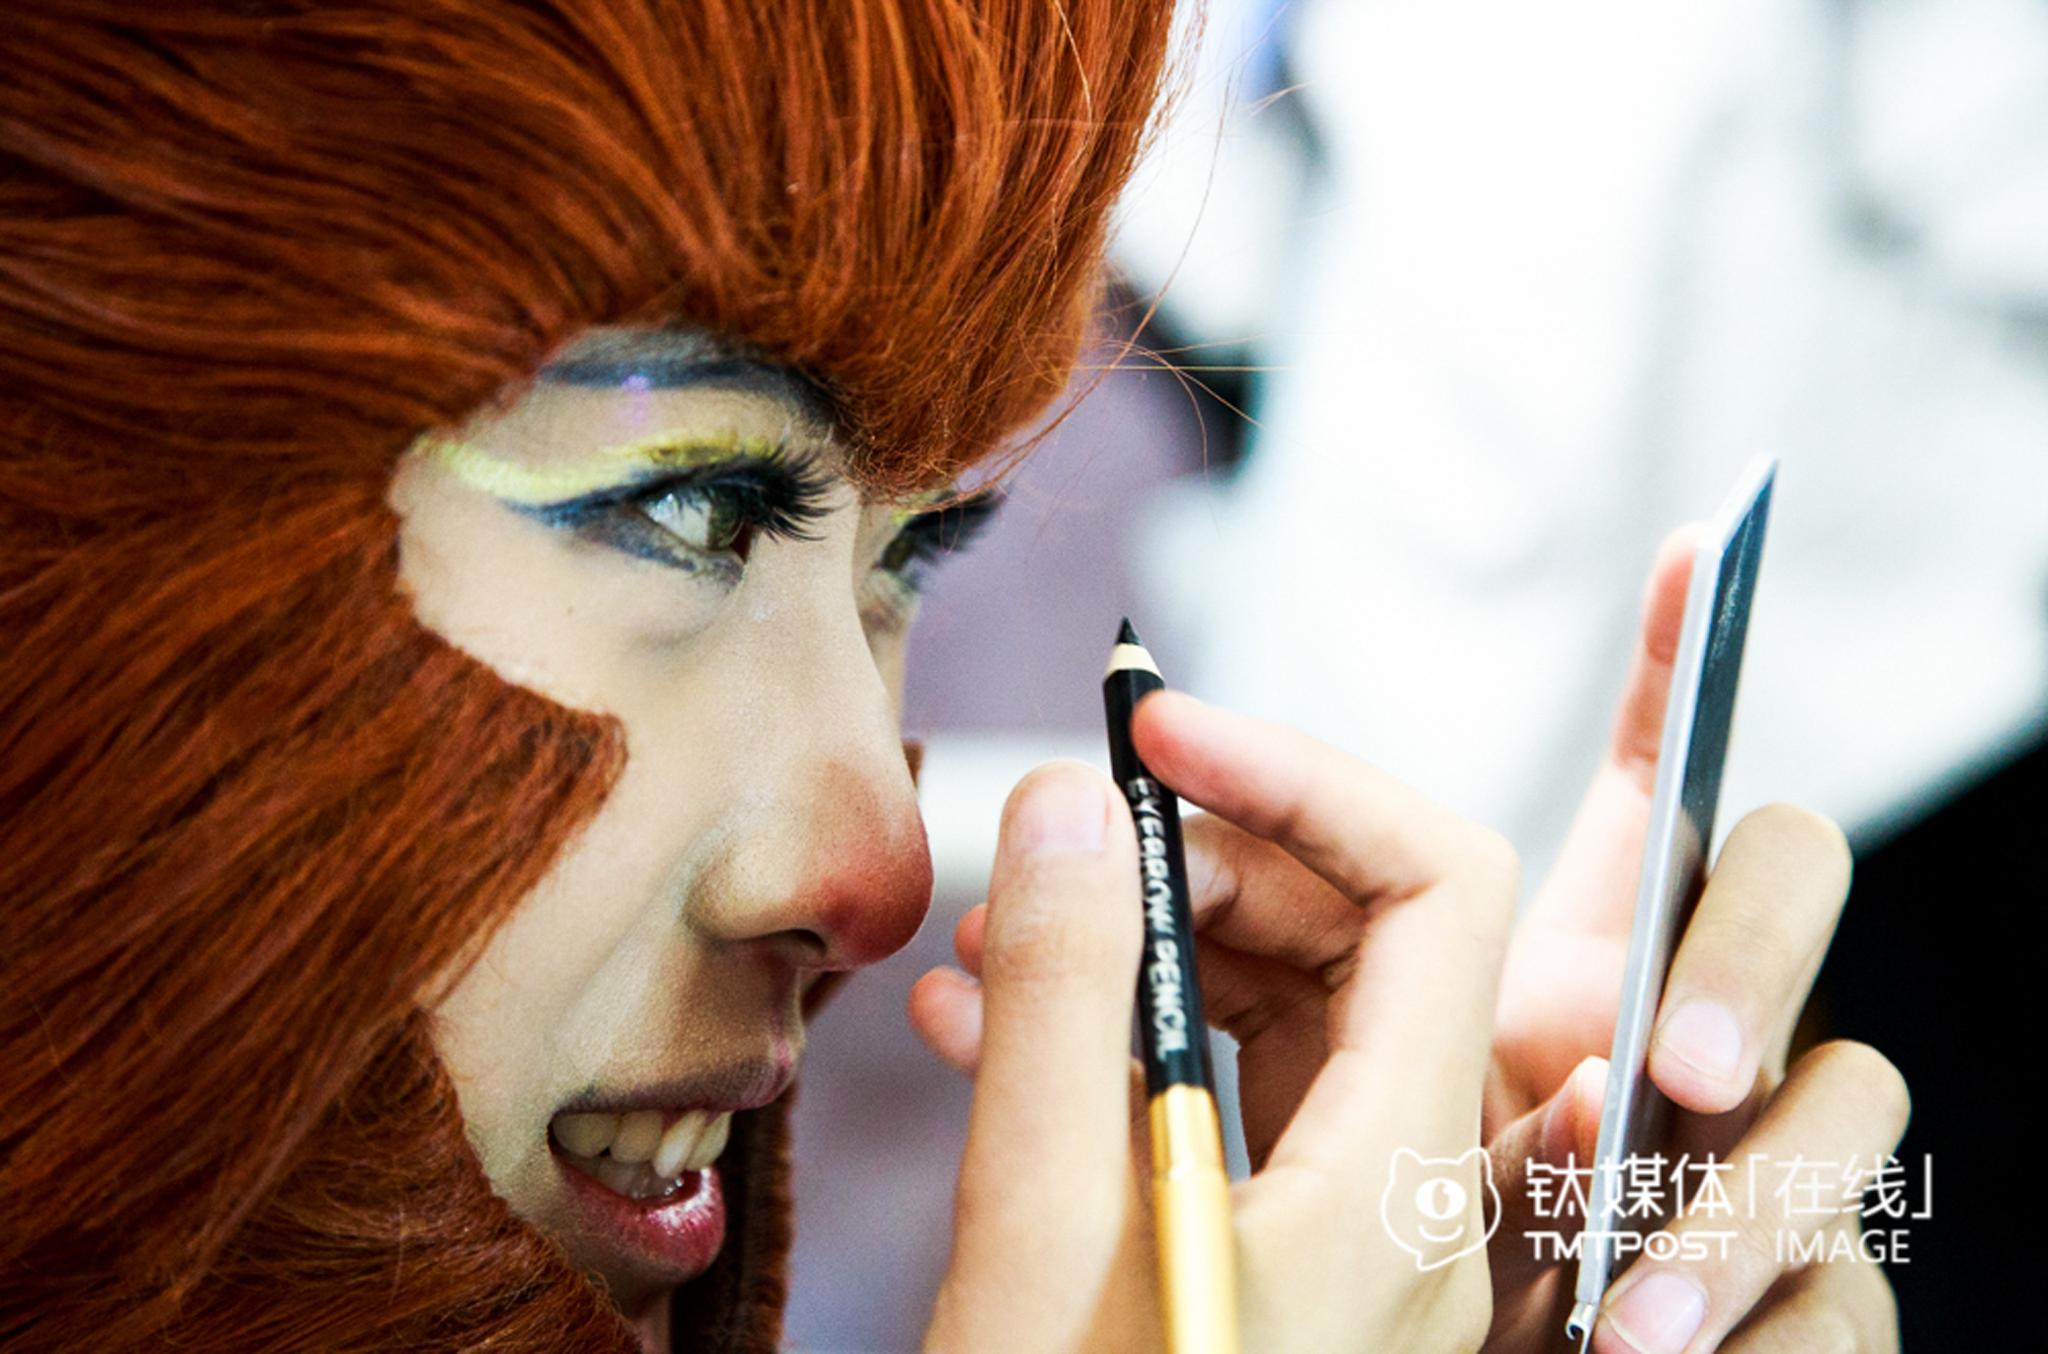 Coser鹿三,来北京读大学后成为一名职业coser。她正在COS齐天大圣的妆容。有时候室友都不在宿舍时或者新衣服到货,她会穿上Cos服装练习模仿,上一次Cos妆容,大概要花去一个半小时。